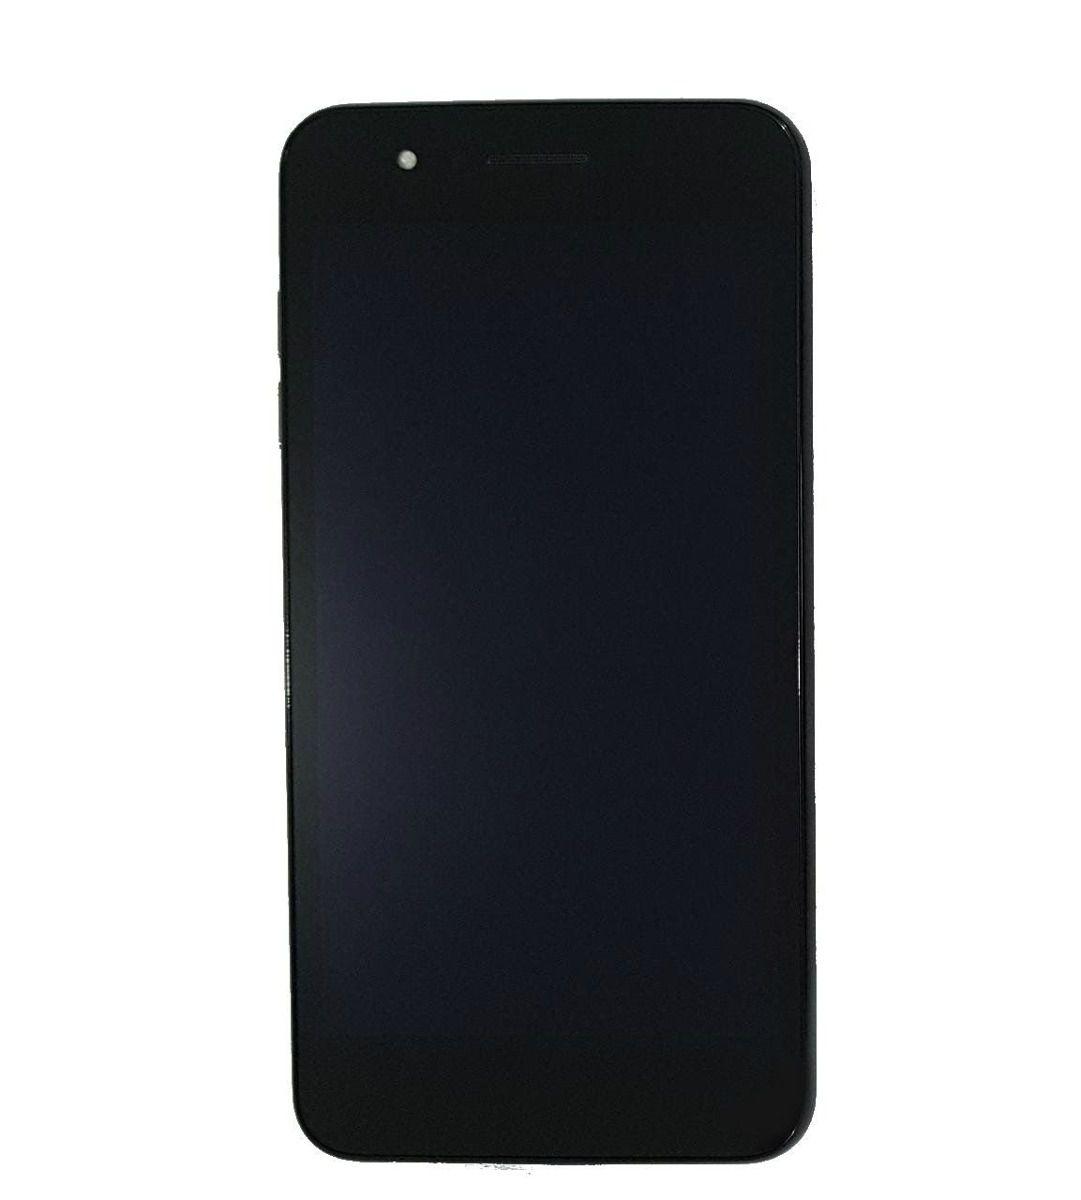 Tela Display completo / Frontal LG K9 2018 X210 Preto Com aro